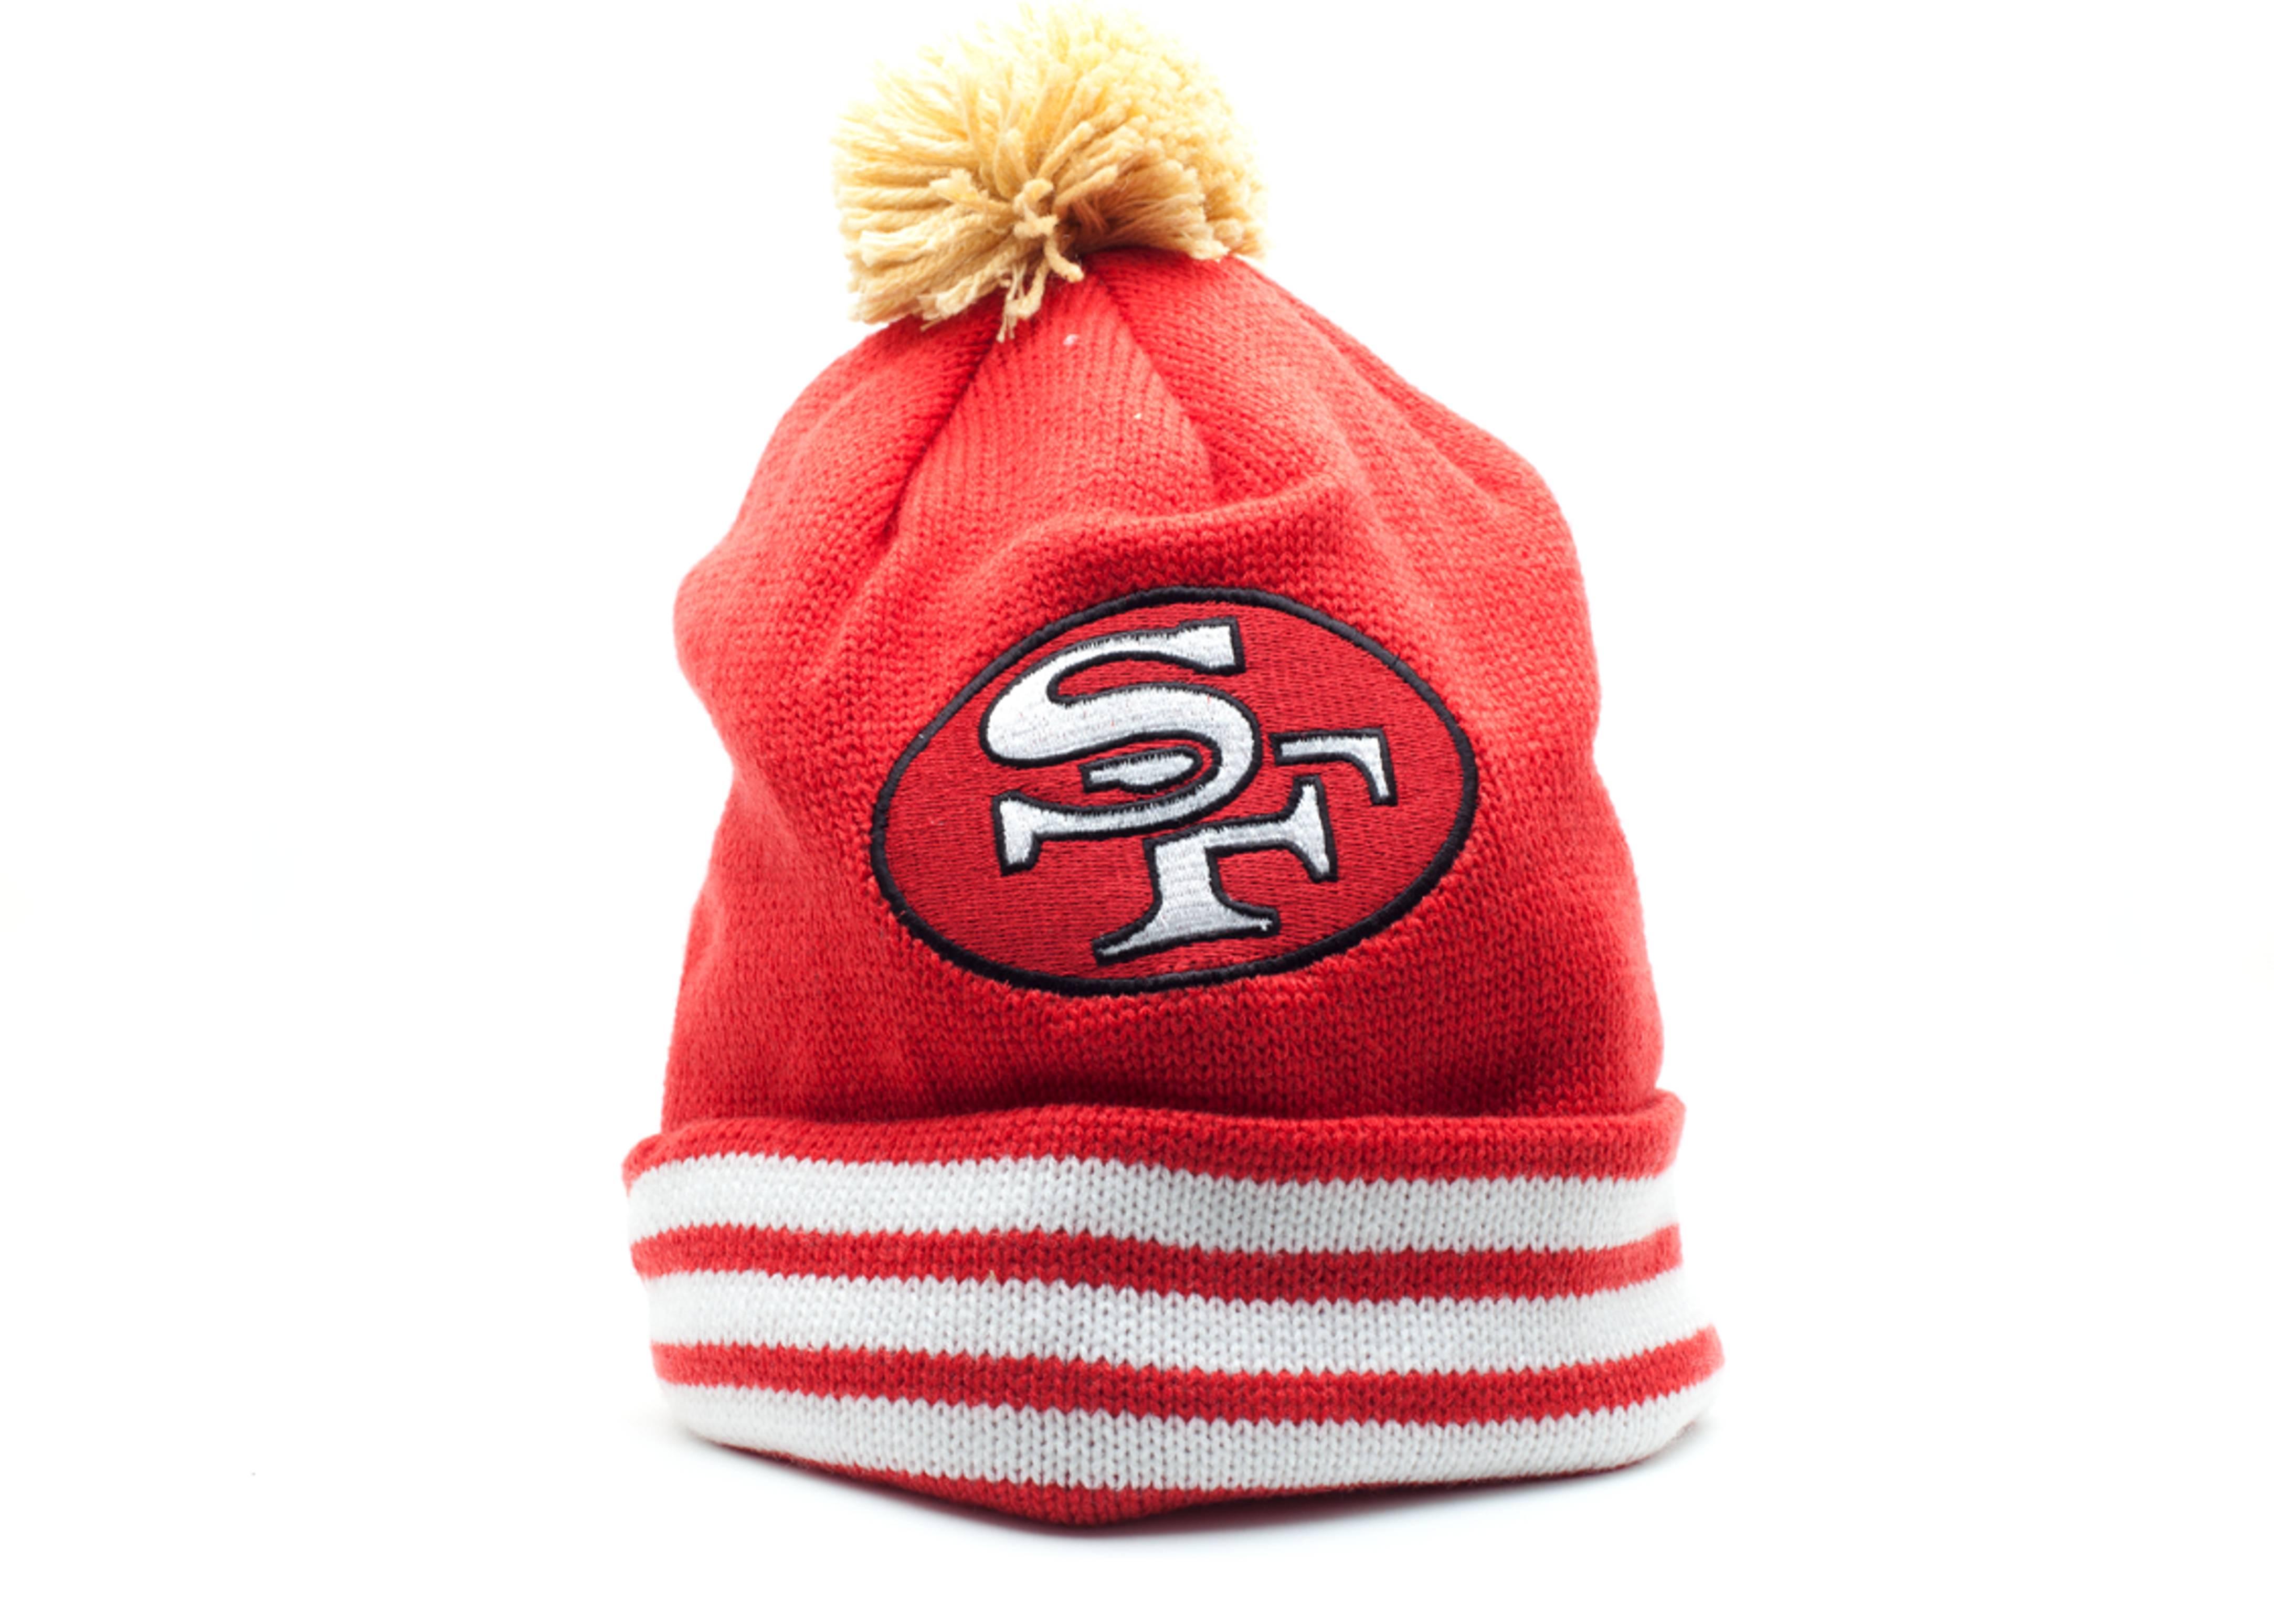 san francisco 49ers cuffed pom knit beanie